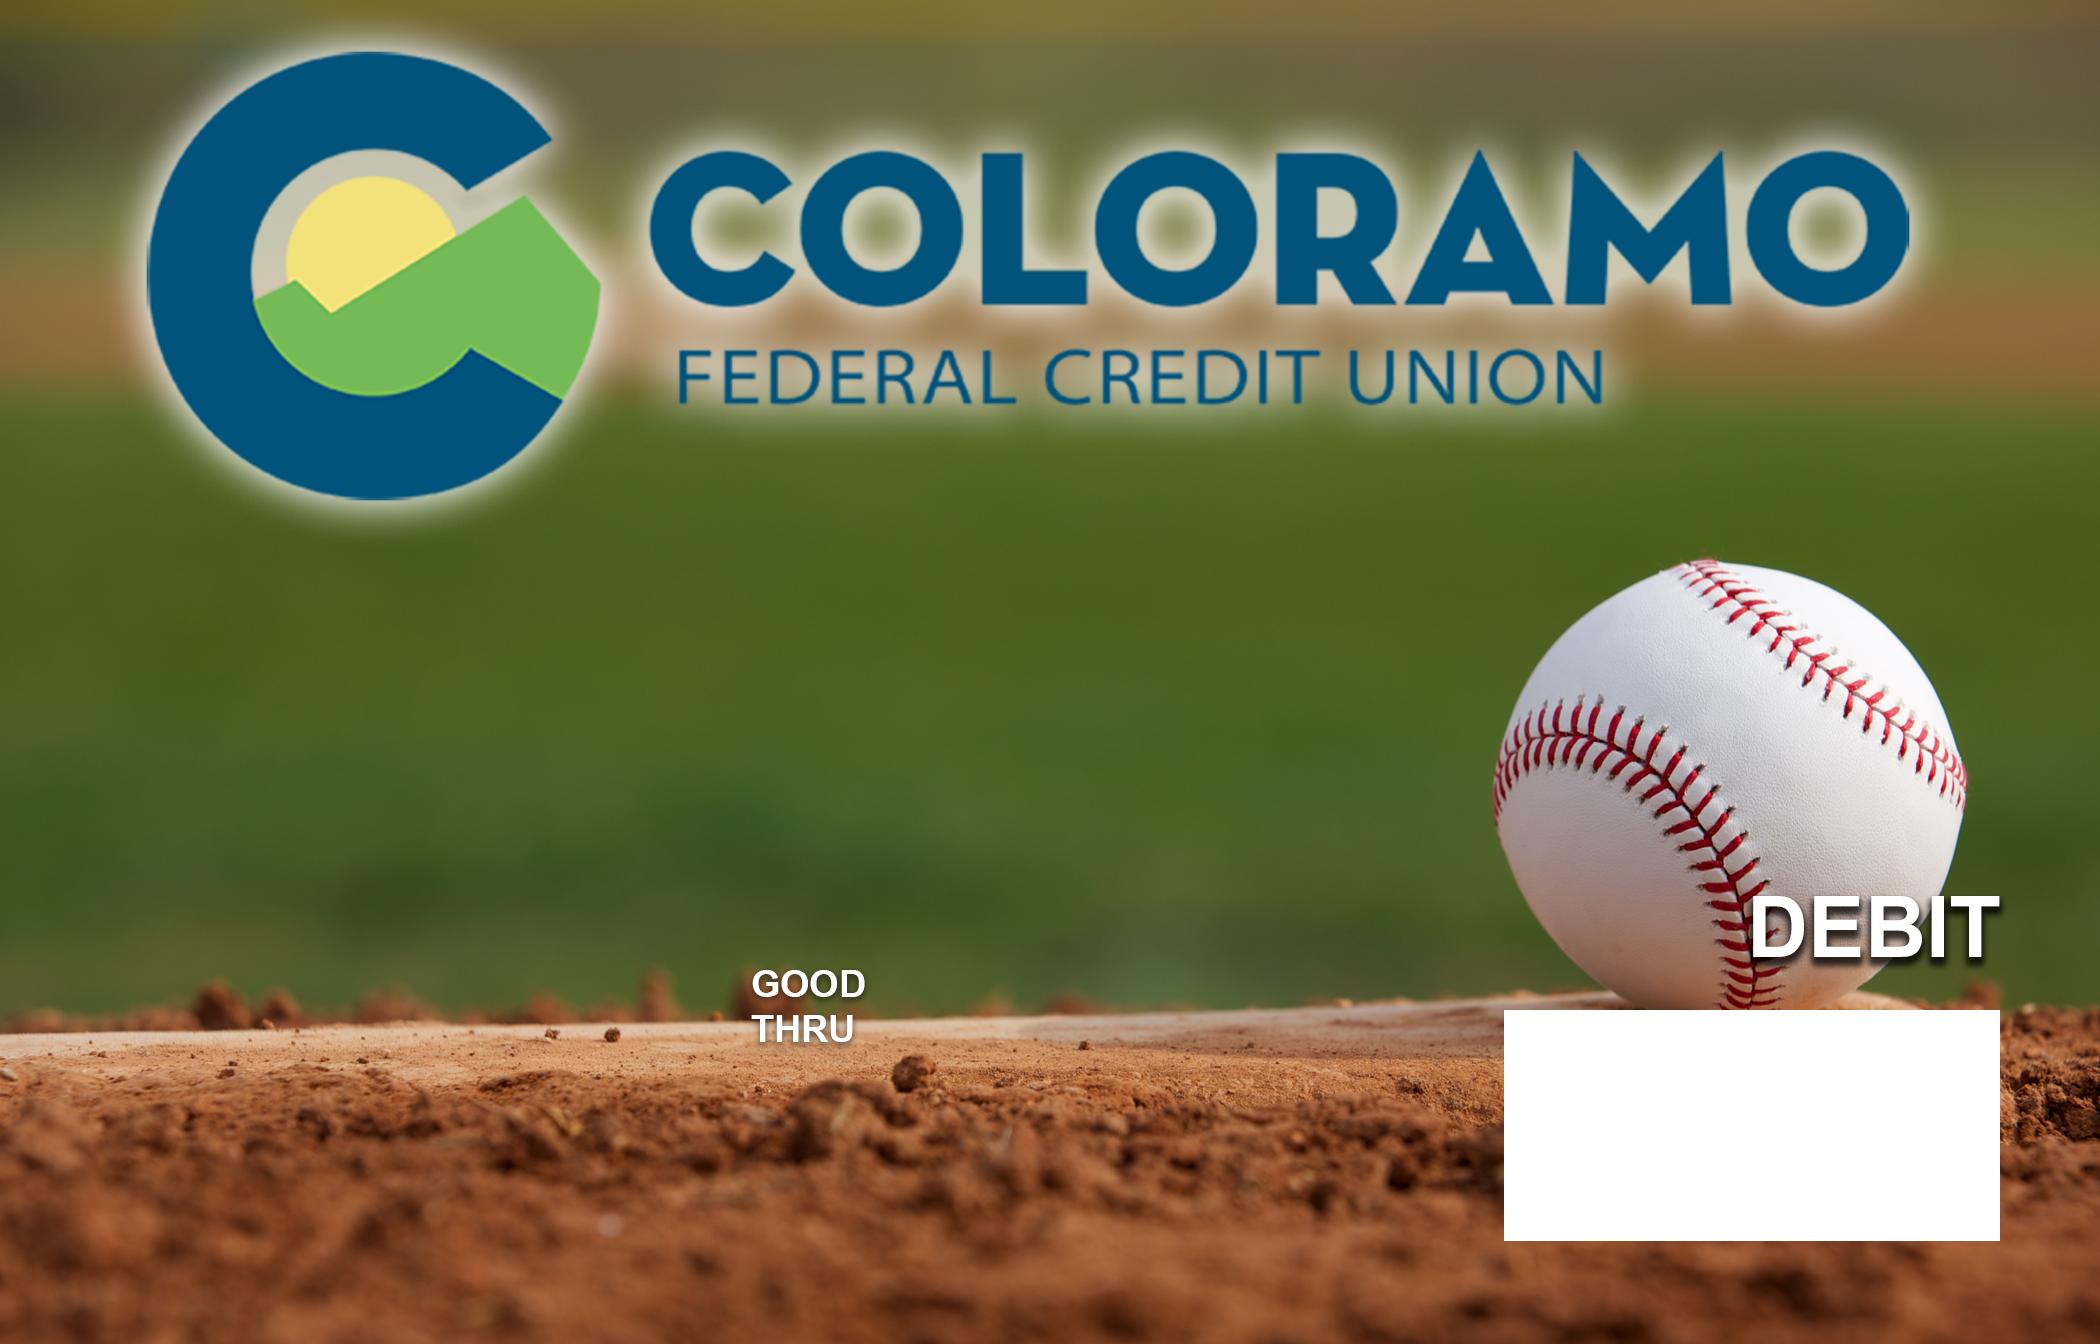 Coloramo Federal CU Debit Card Baseball 2.png